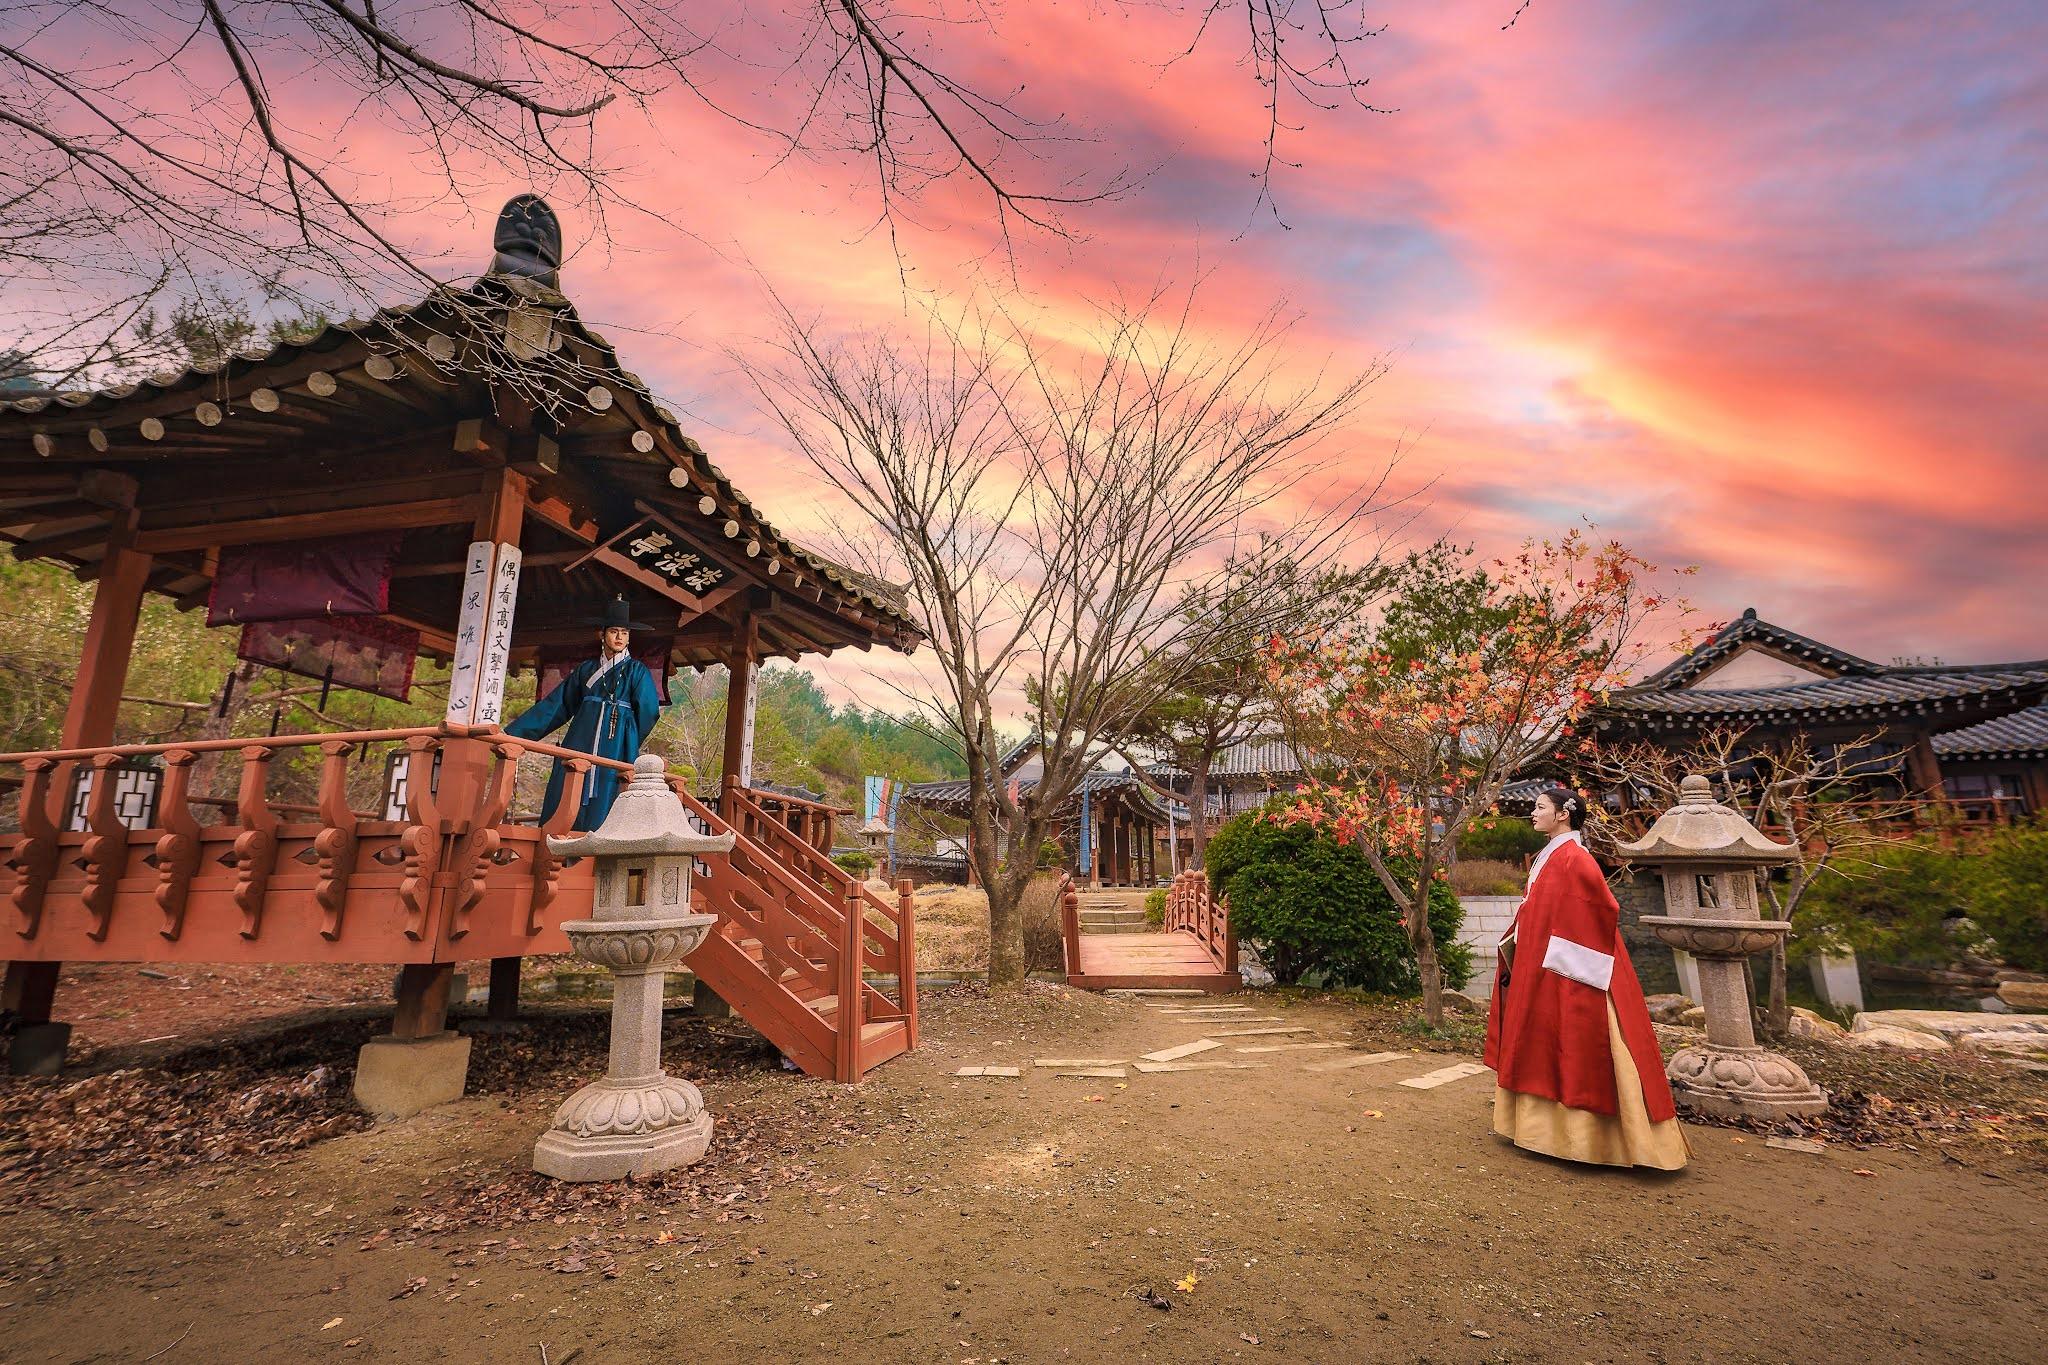 Hubungan Kakak Adik di Drama Korea, Mulai dari Perebutan Tahta Hingga Relate dengan Kehidupan